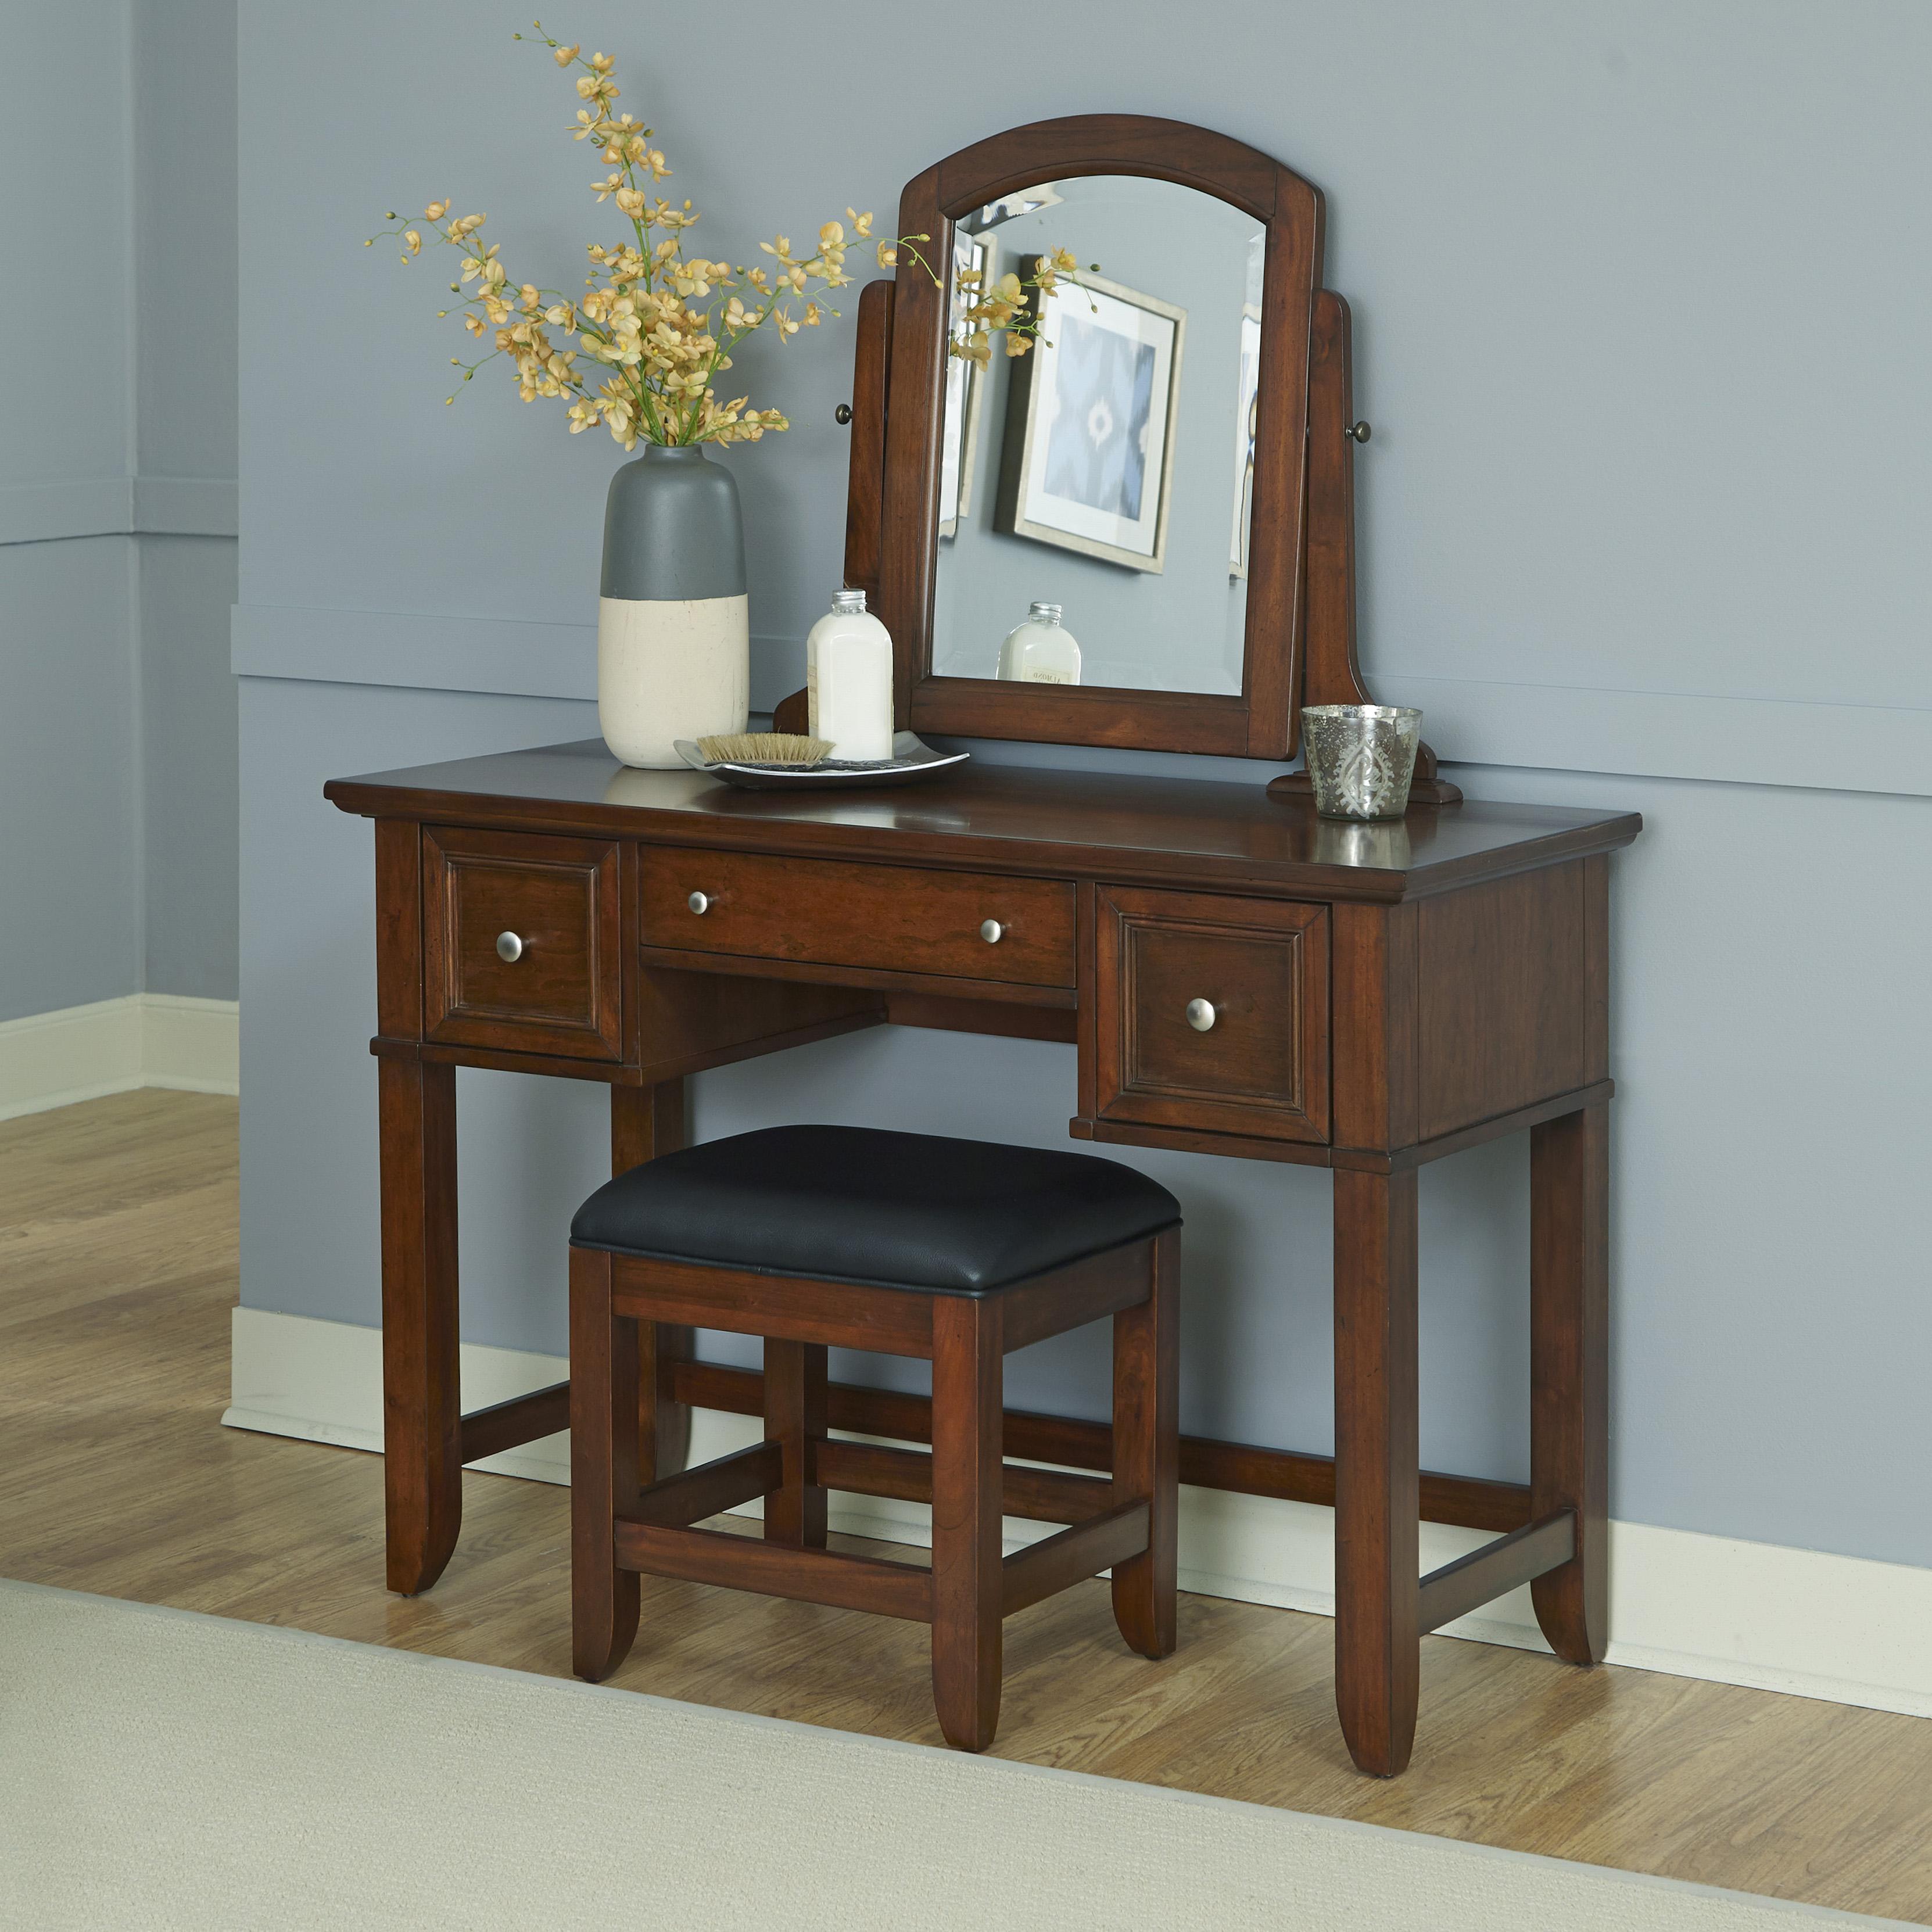 Home Styles Chesapeake Vanity And Bench - Furniture